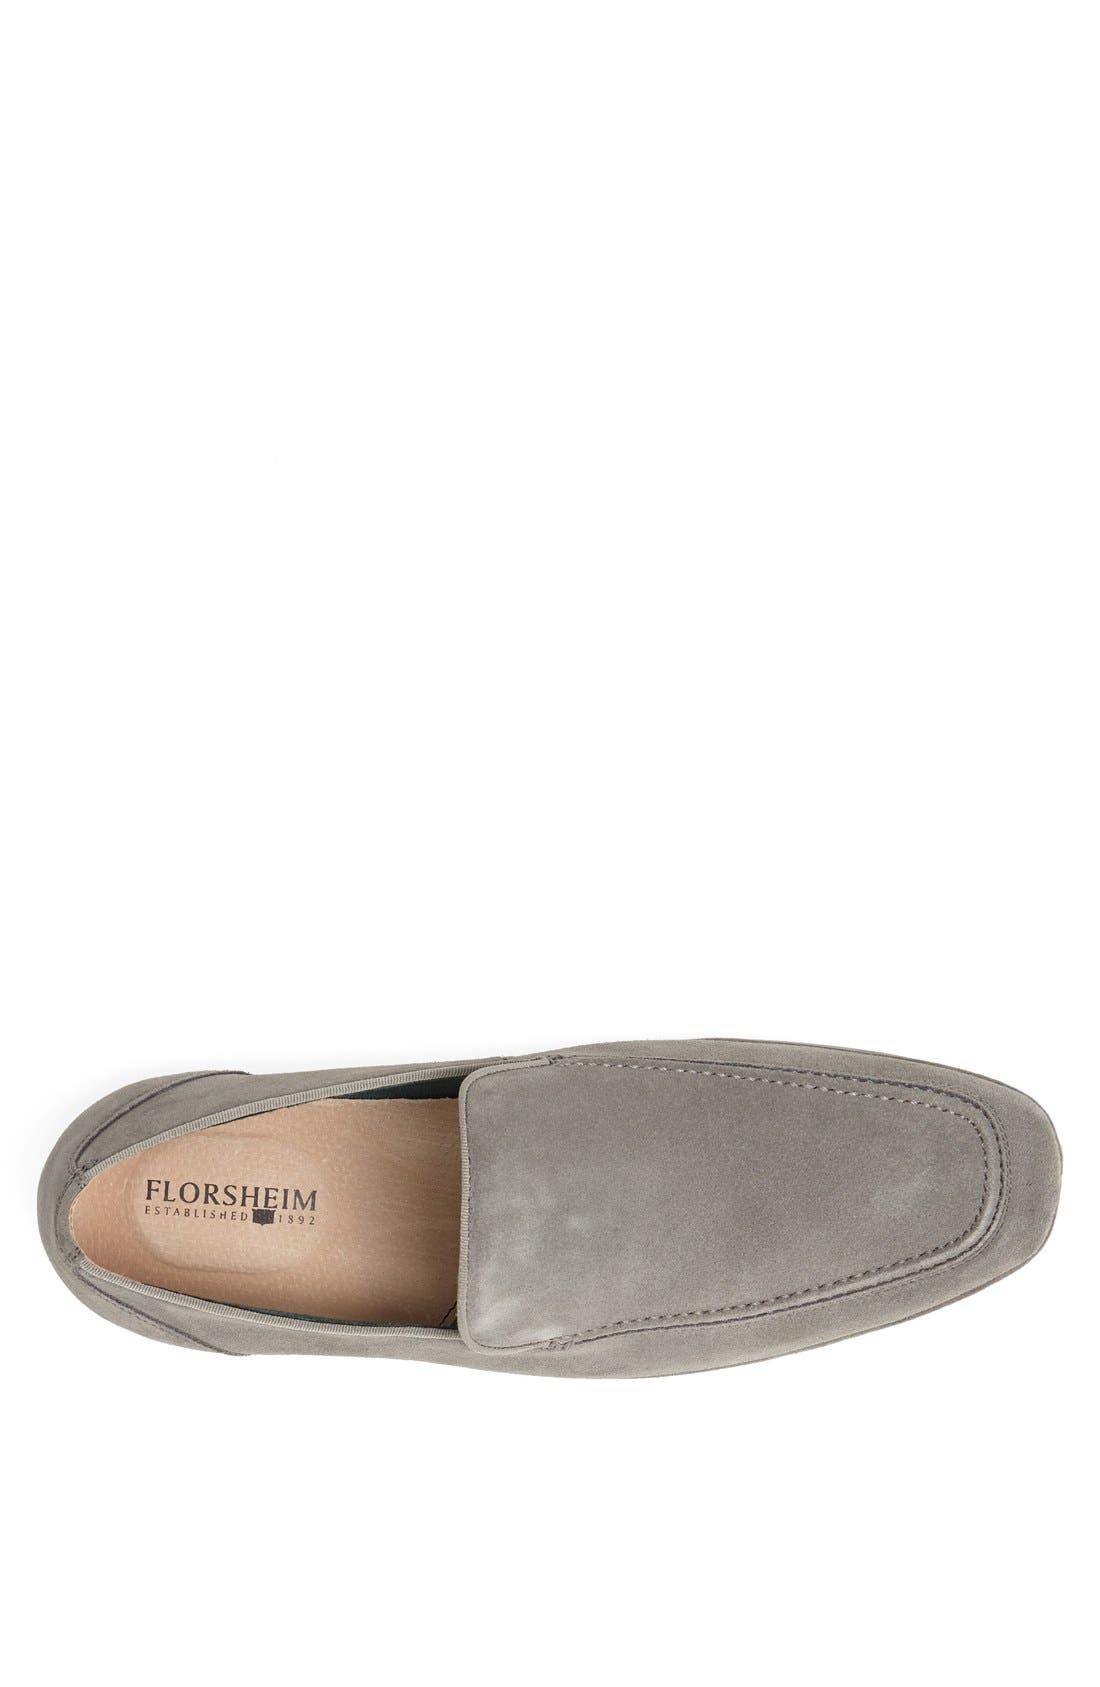 Alternate Image 3  - Florsheim 'Fluent' Suede Venetian Loafer